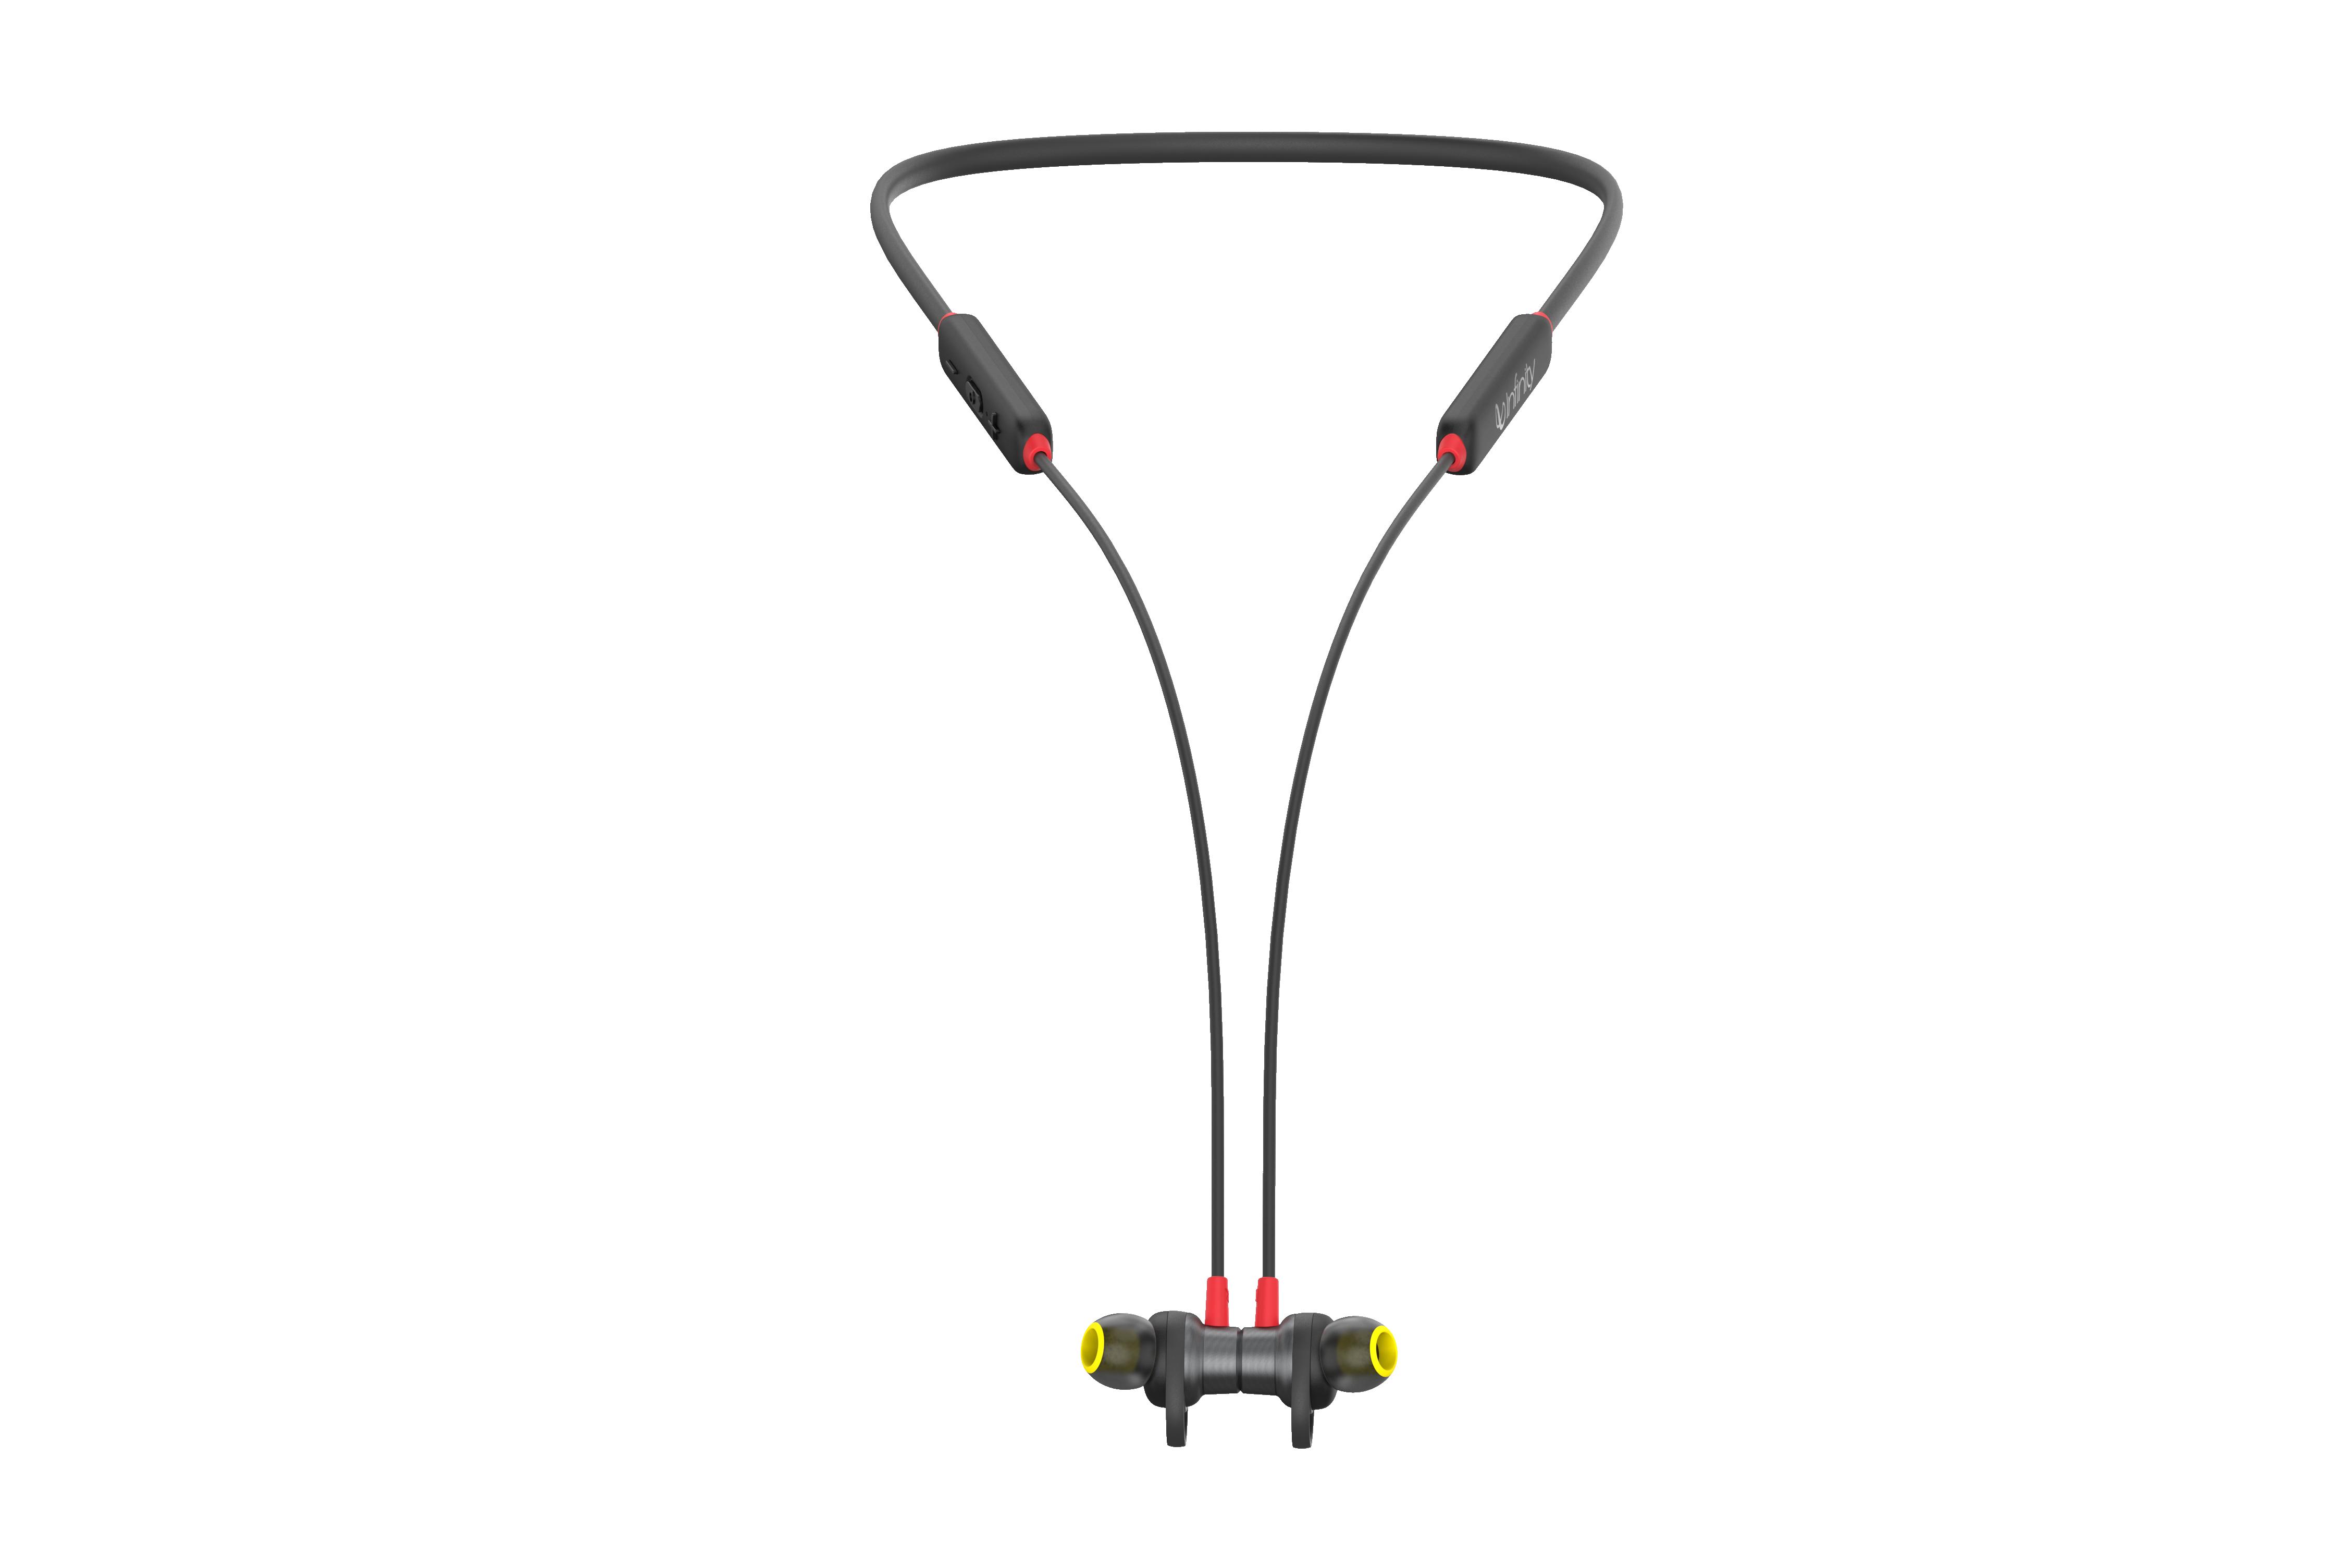 INFINITY GLIDE N120 - Black / Red - Back